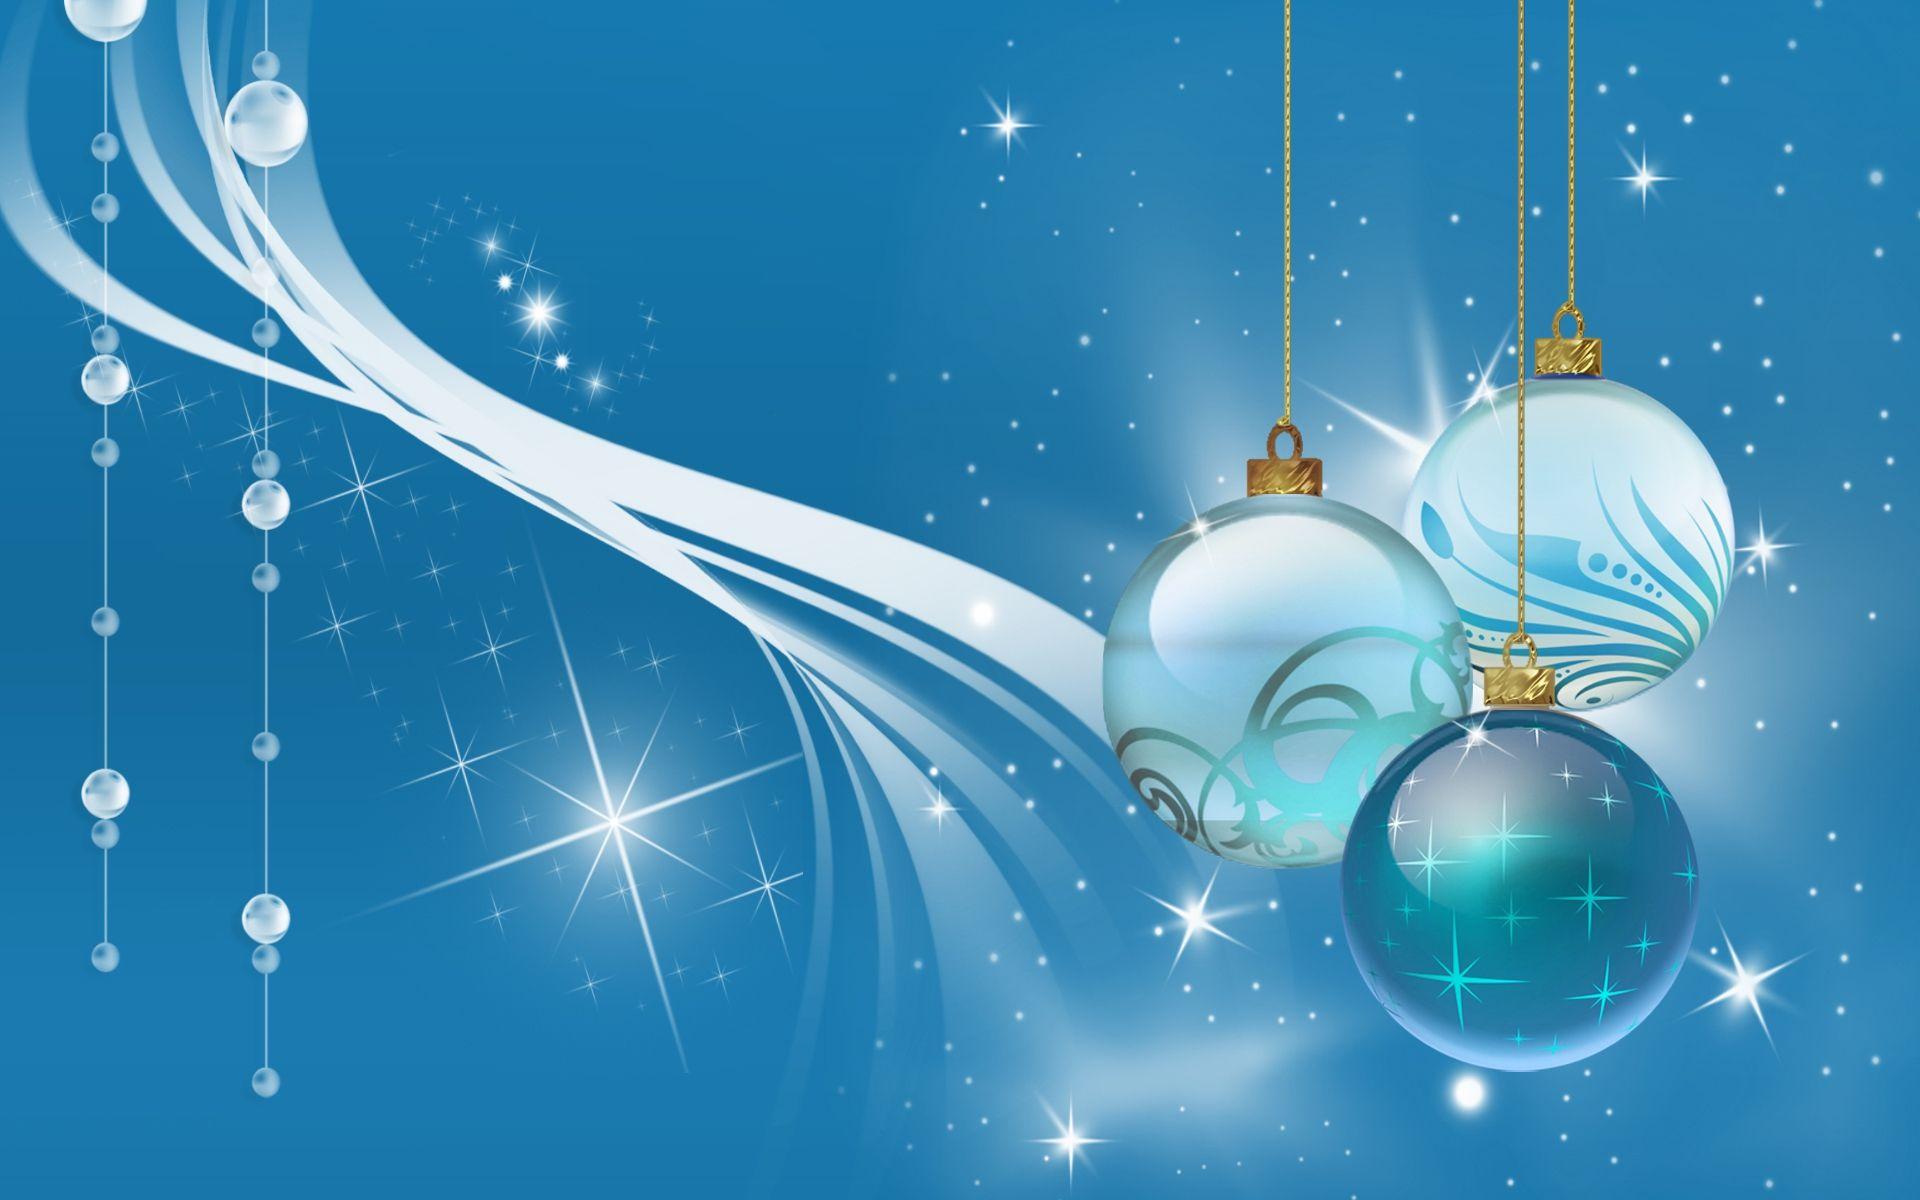 Blue Christmas Wallpaper Hd Pixelstalk Net Christmas Wallpaper Hd Christmas Wallpaper Christmas Desktop